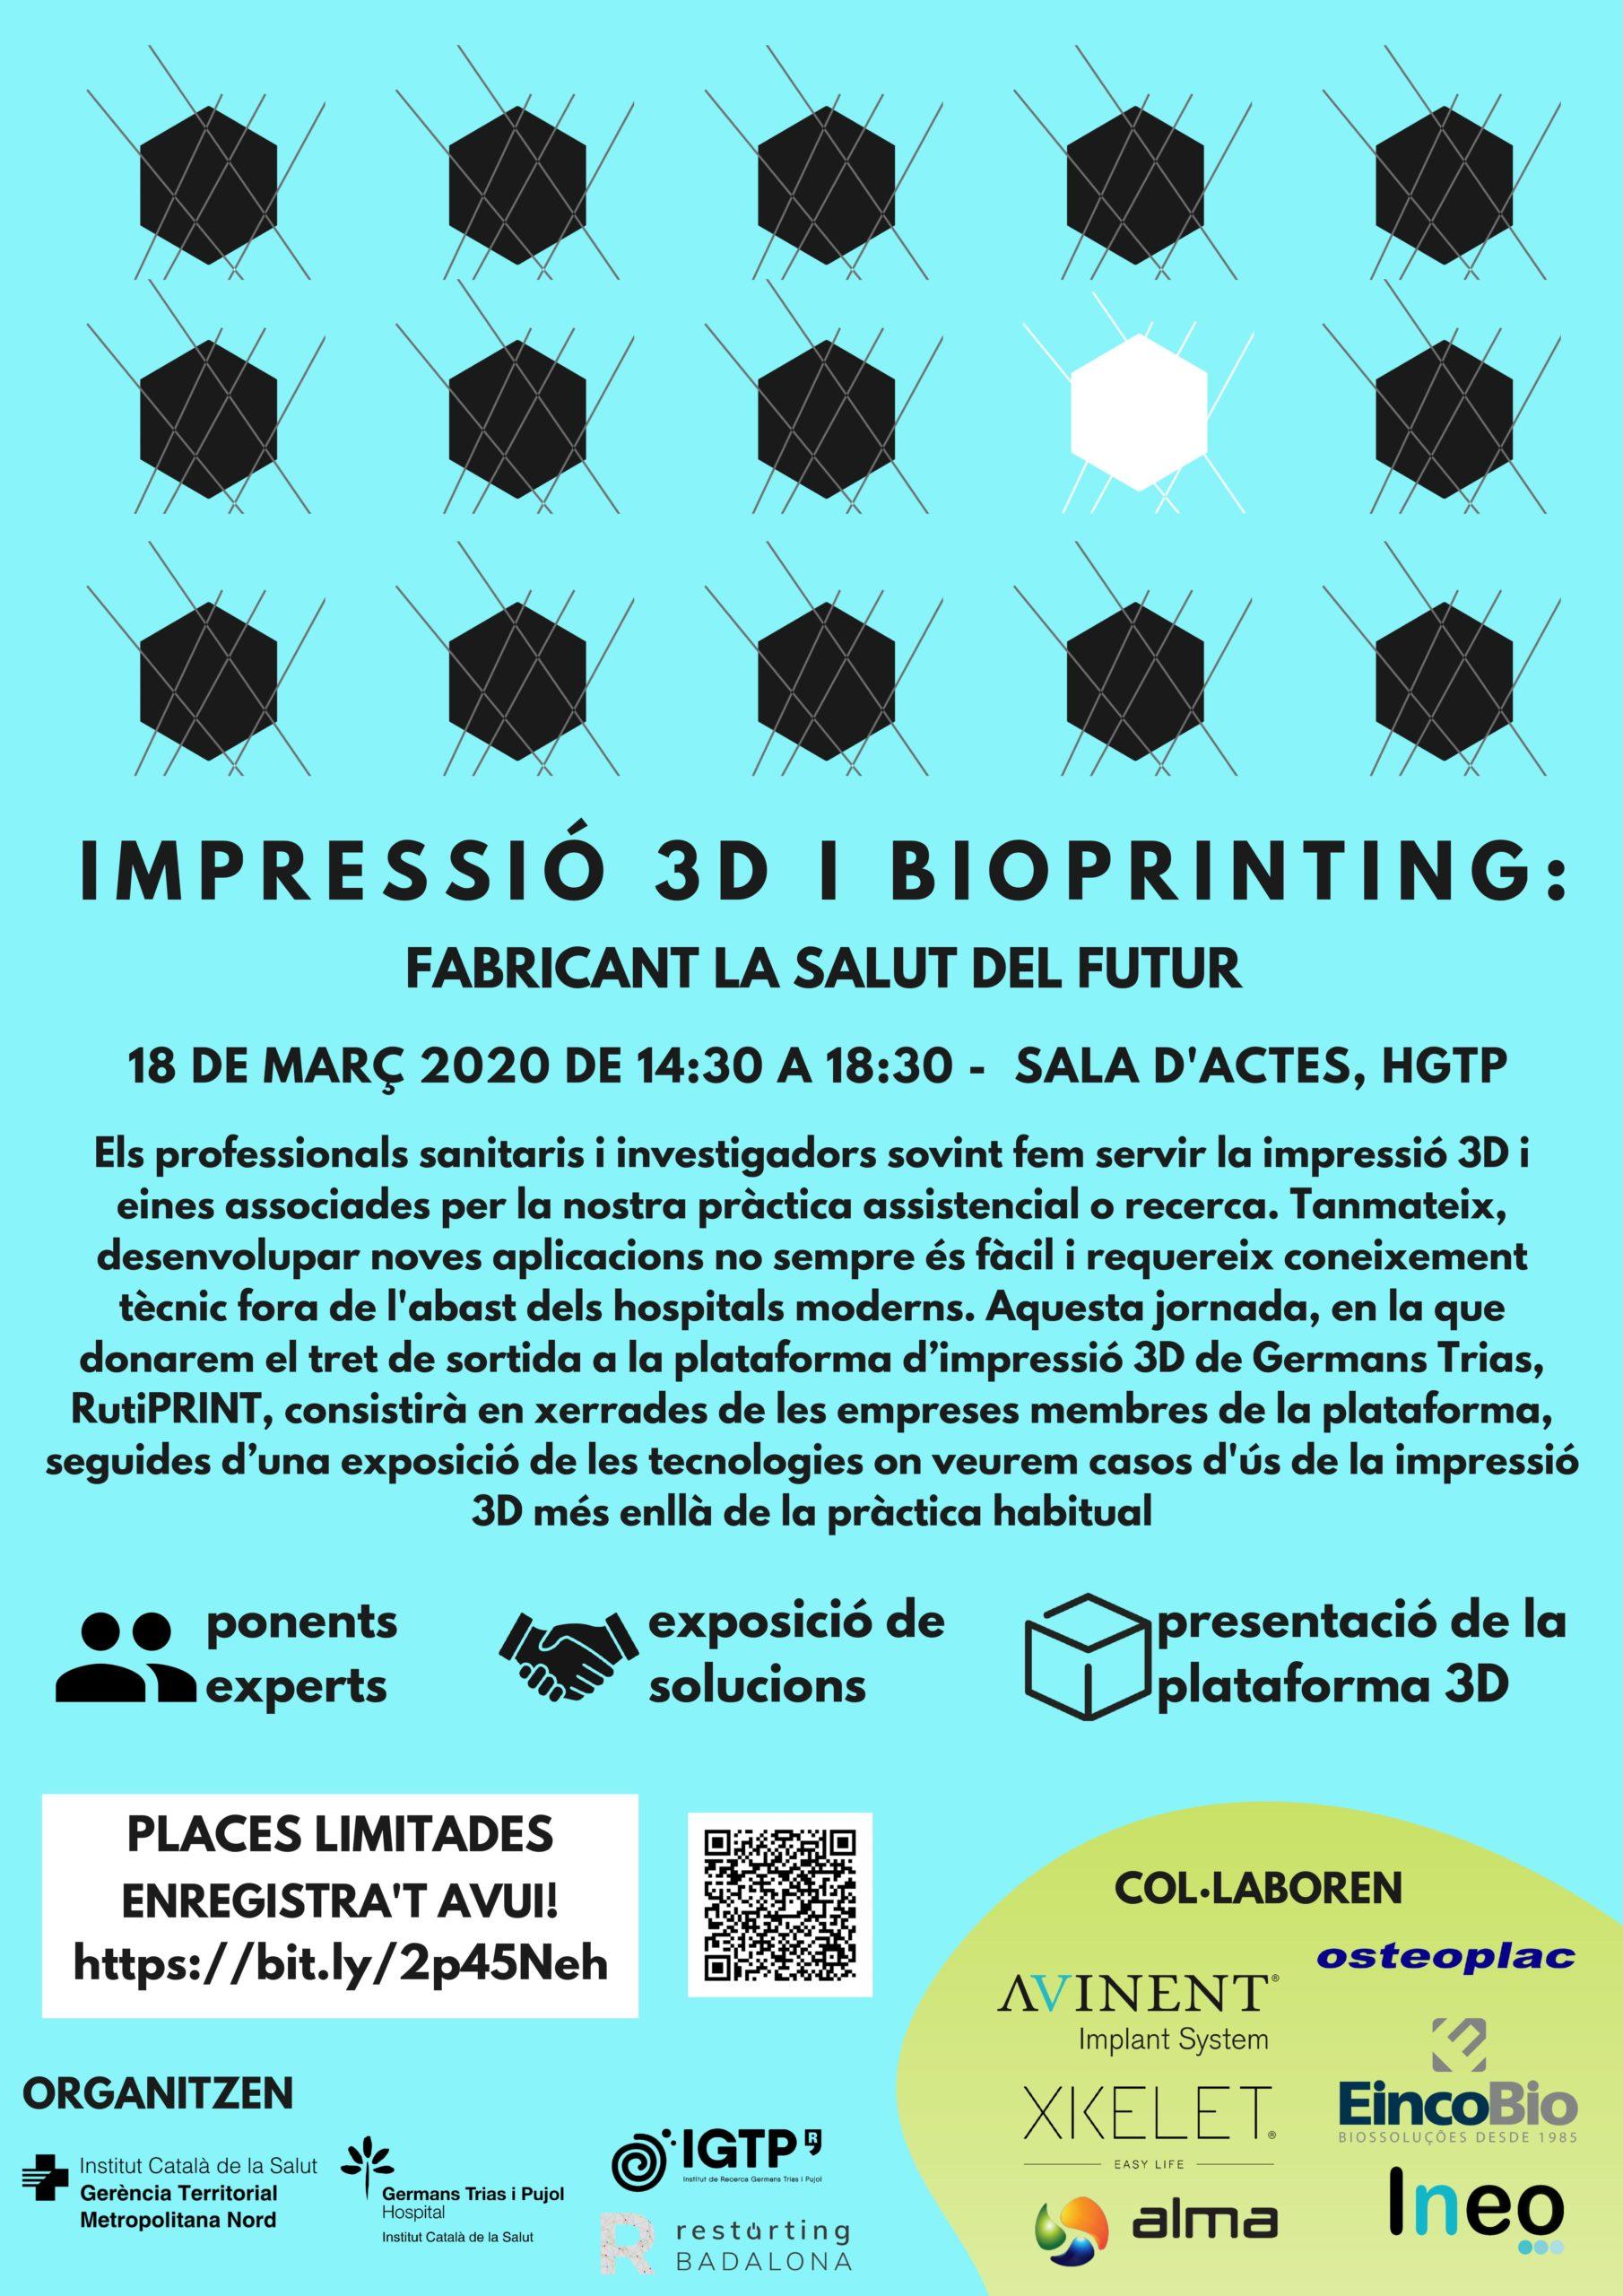 Impressiói 3D i Bioprinting